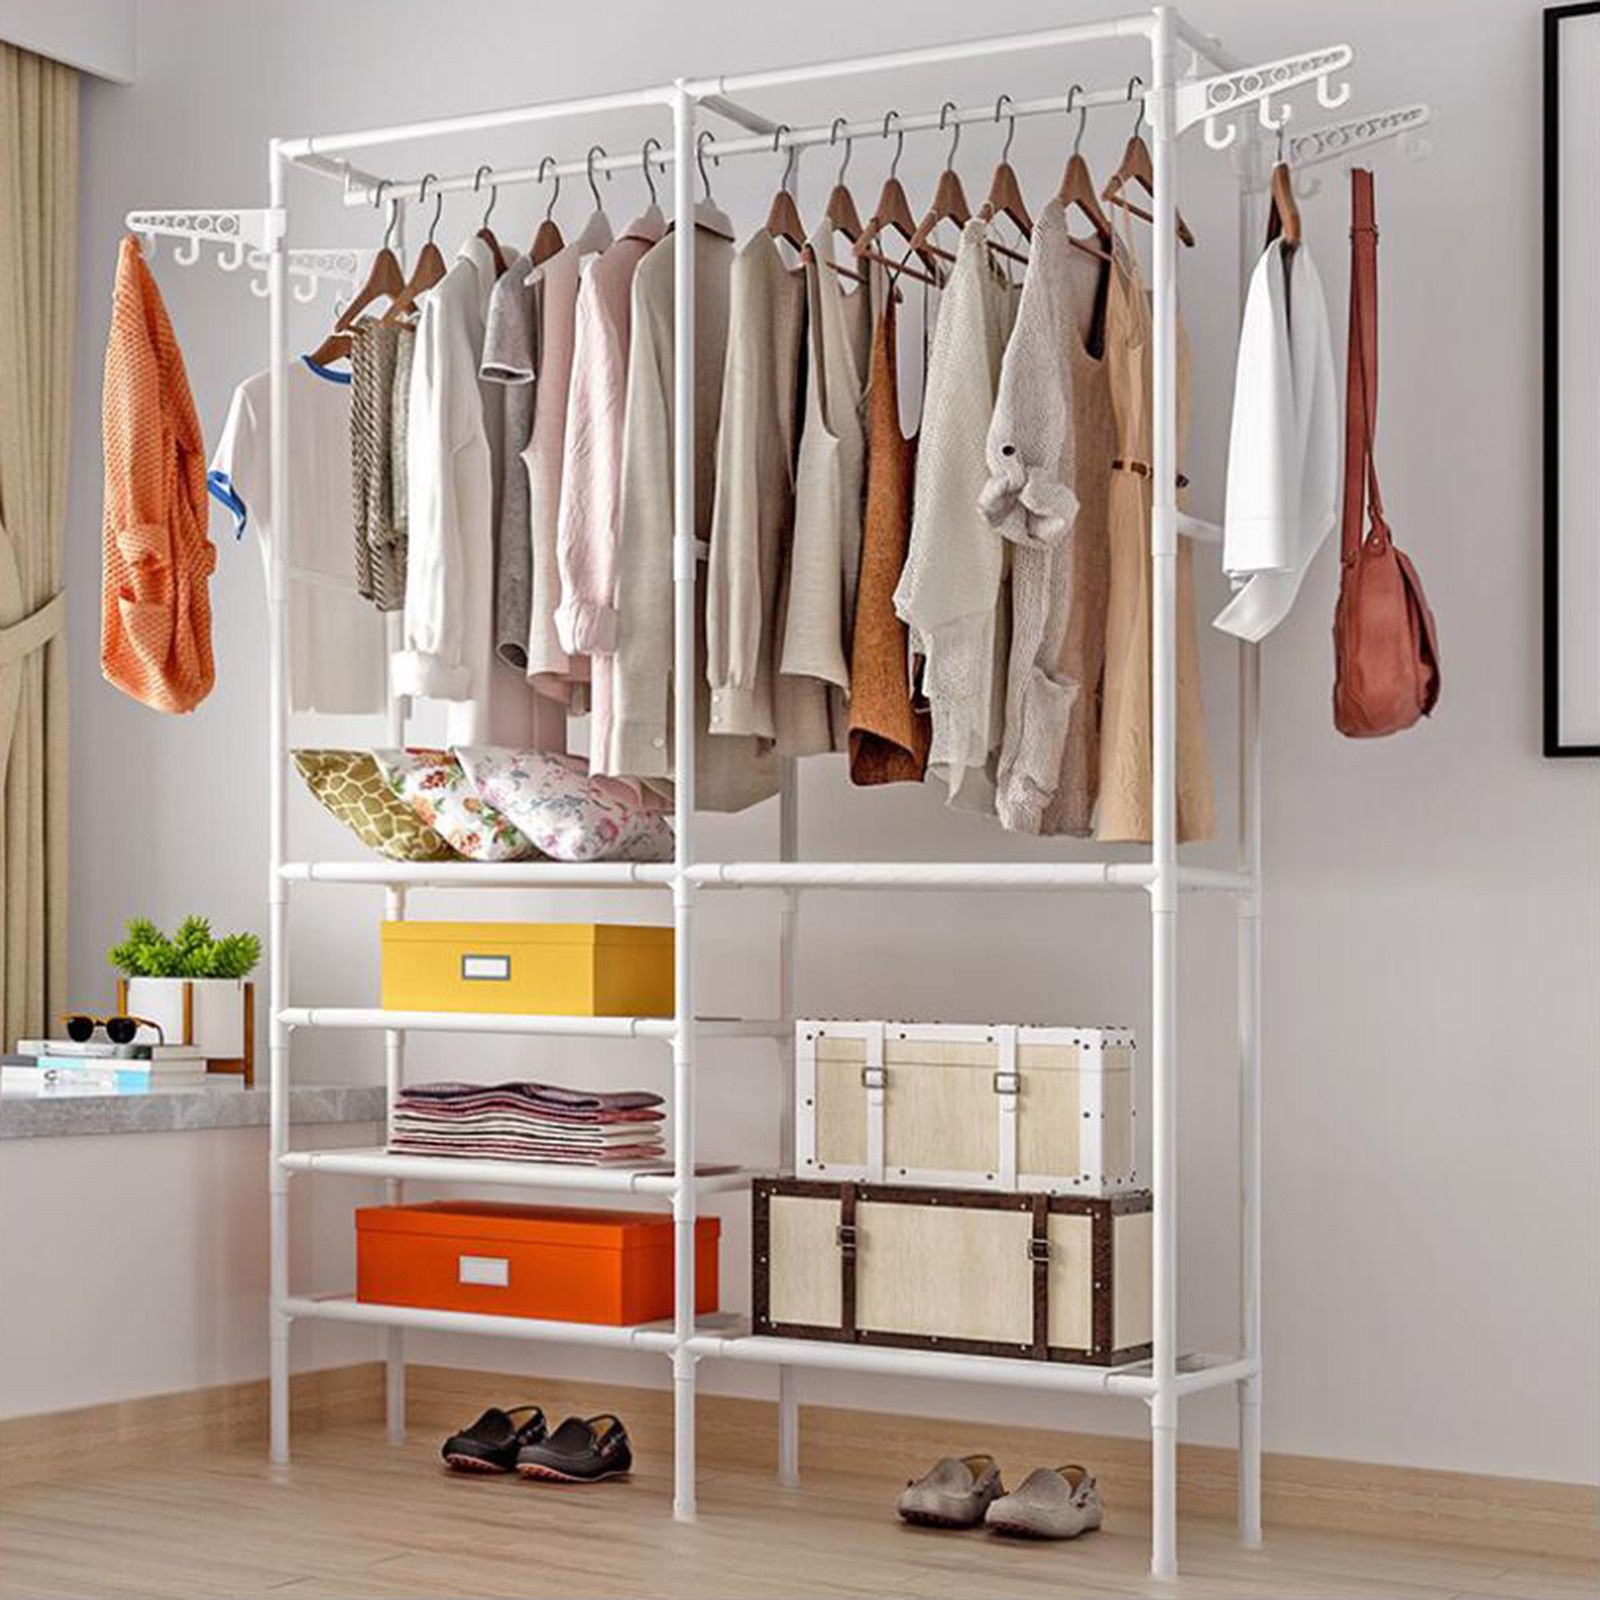 Portable Closet Organizer Storage Rack Clothes Hanger Garment Shelf Rack 2 Col Wardrobe Storage Storage Closet Organization Closet Shelf Organization